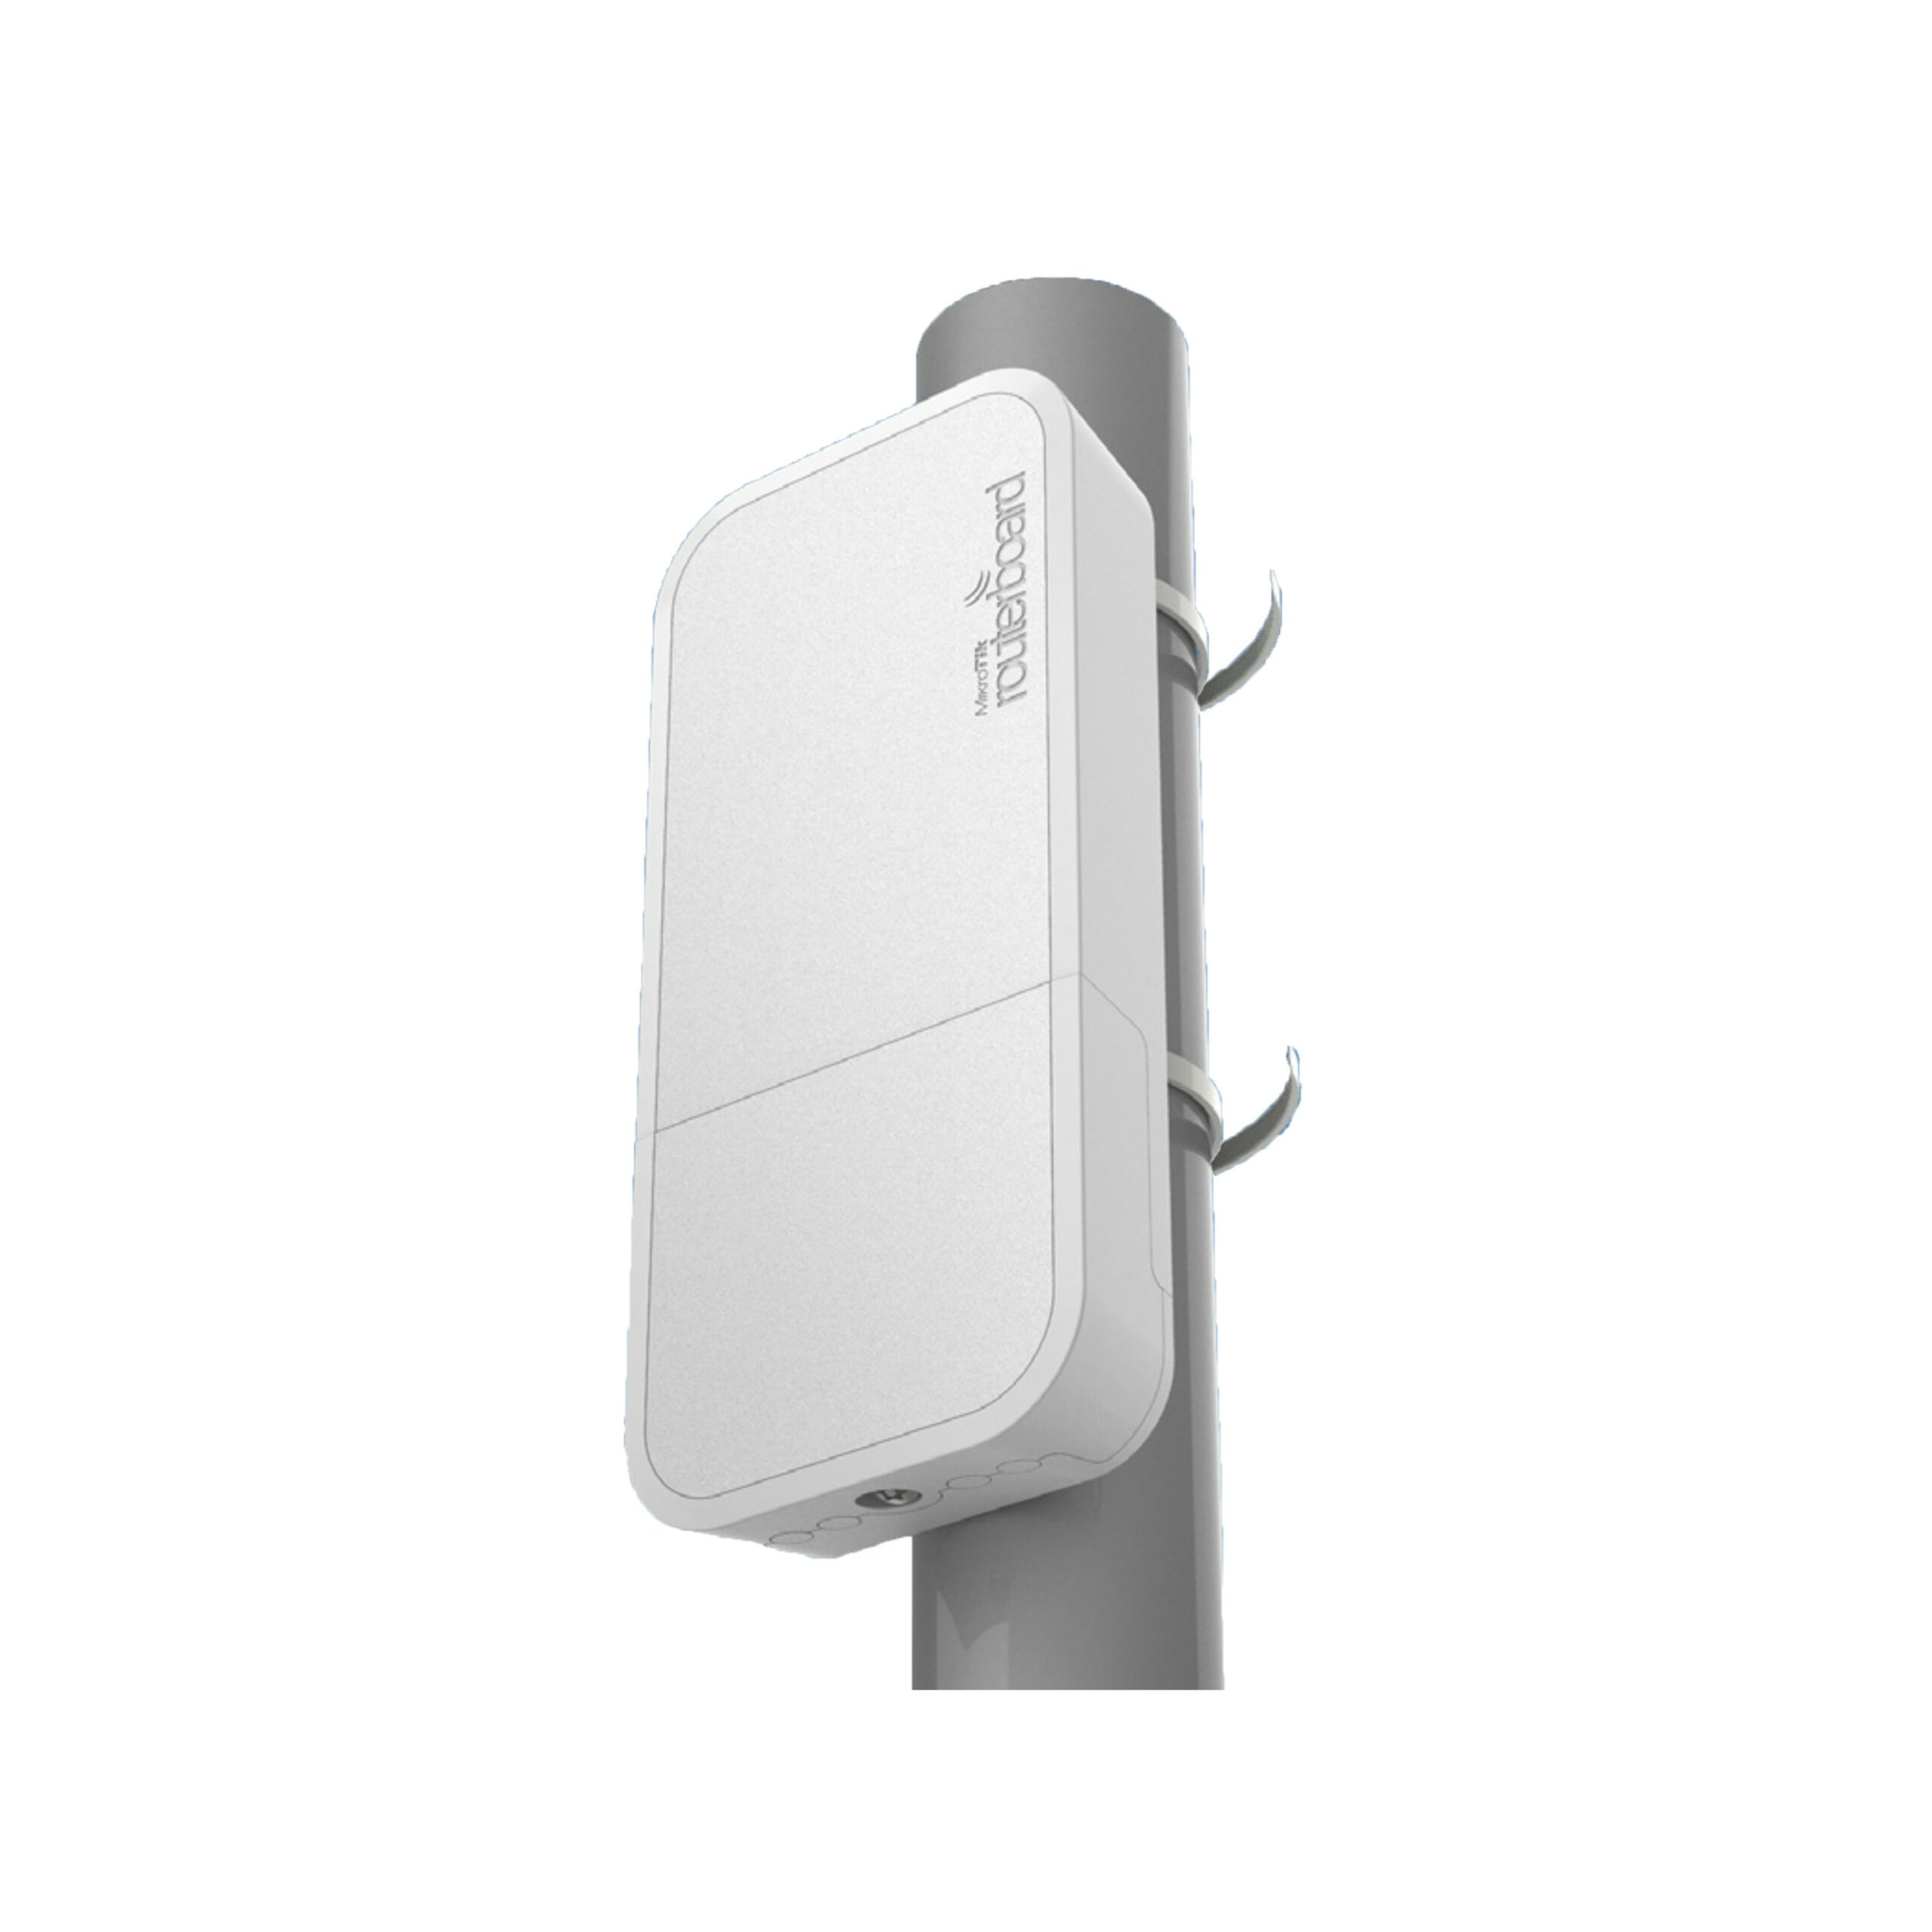 633010 wireless access point